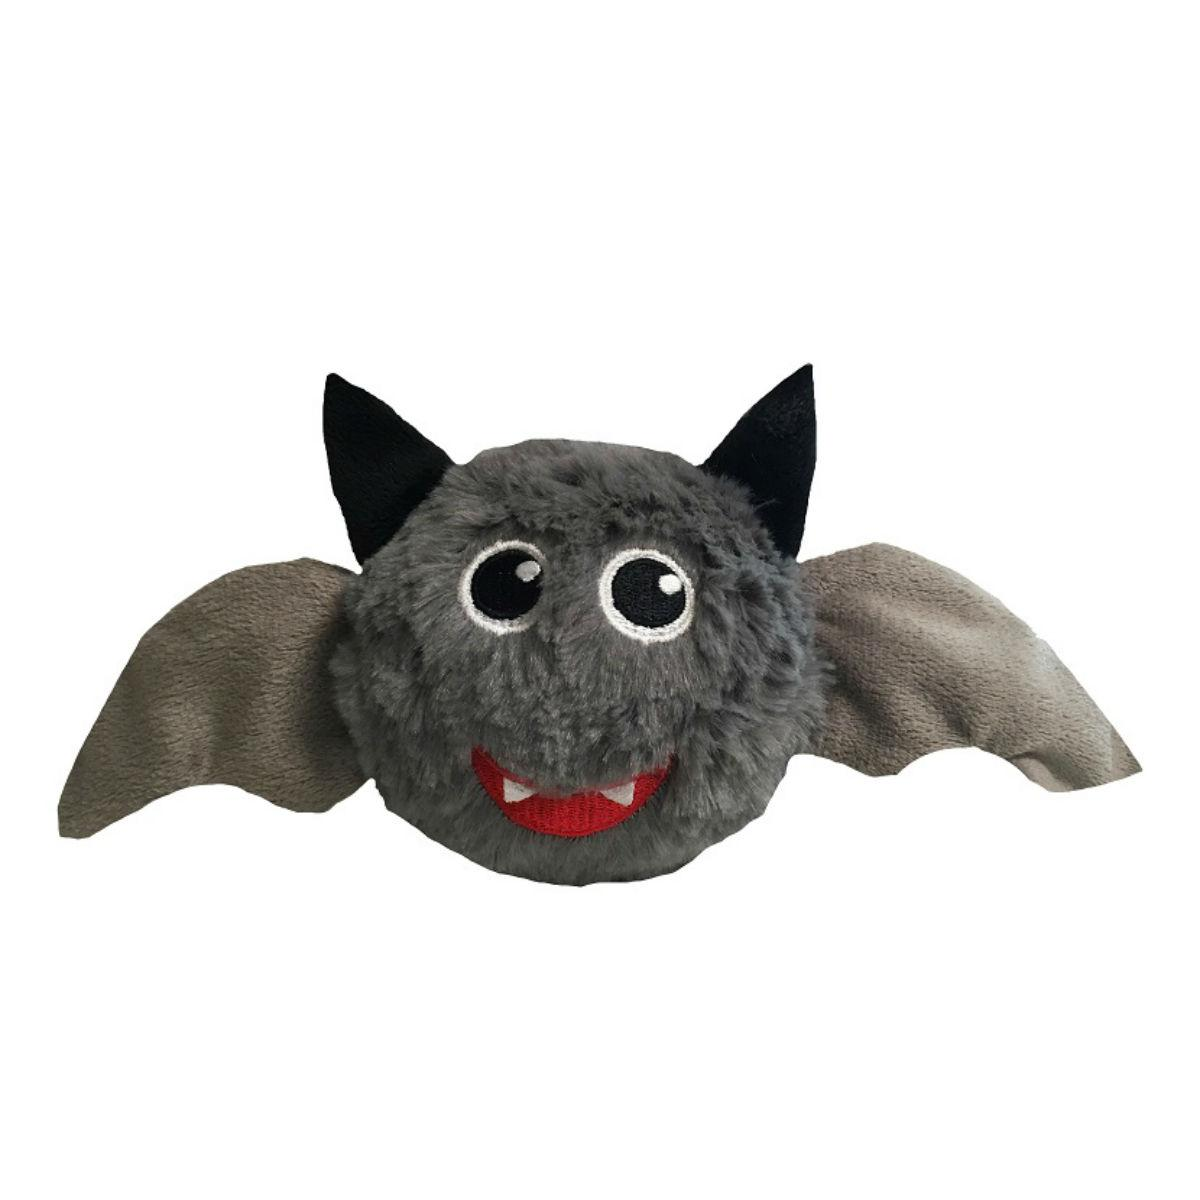 fabdog® Halloween faball® Dog Toy - Bat